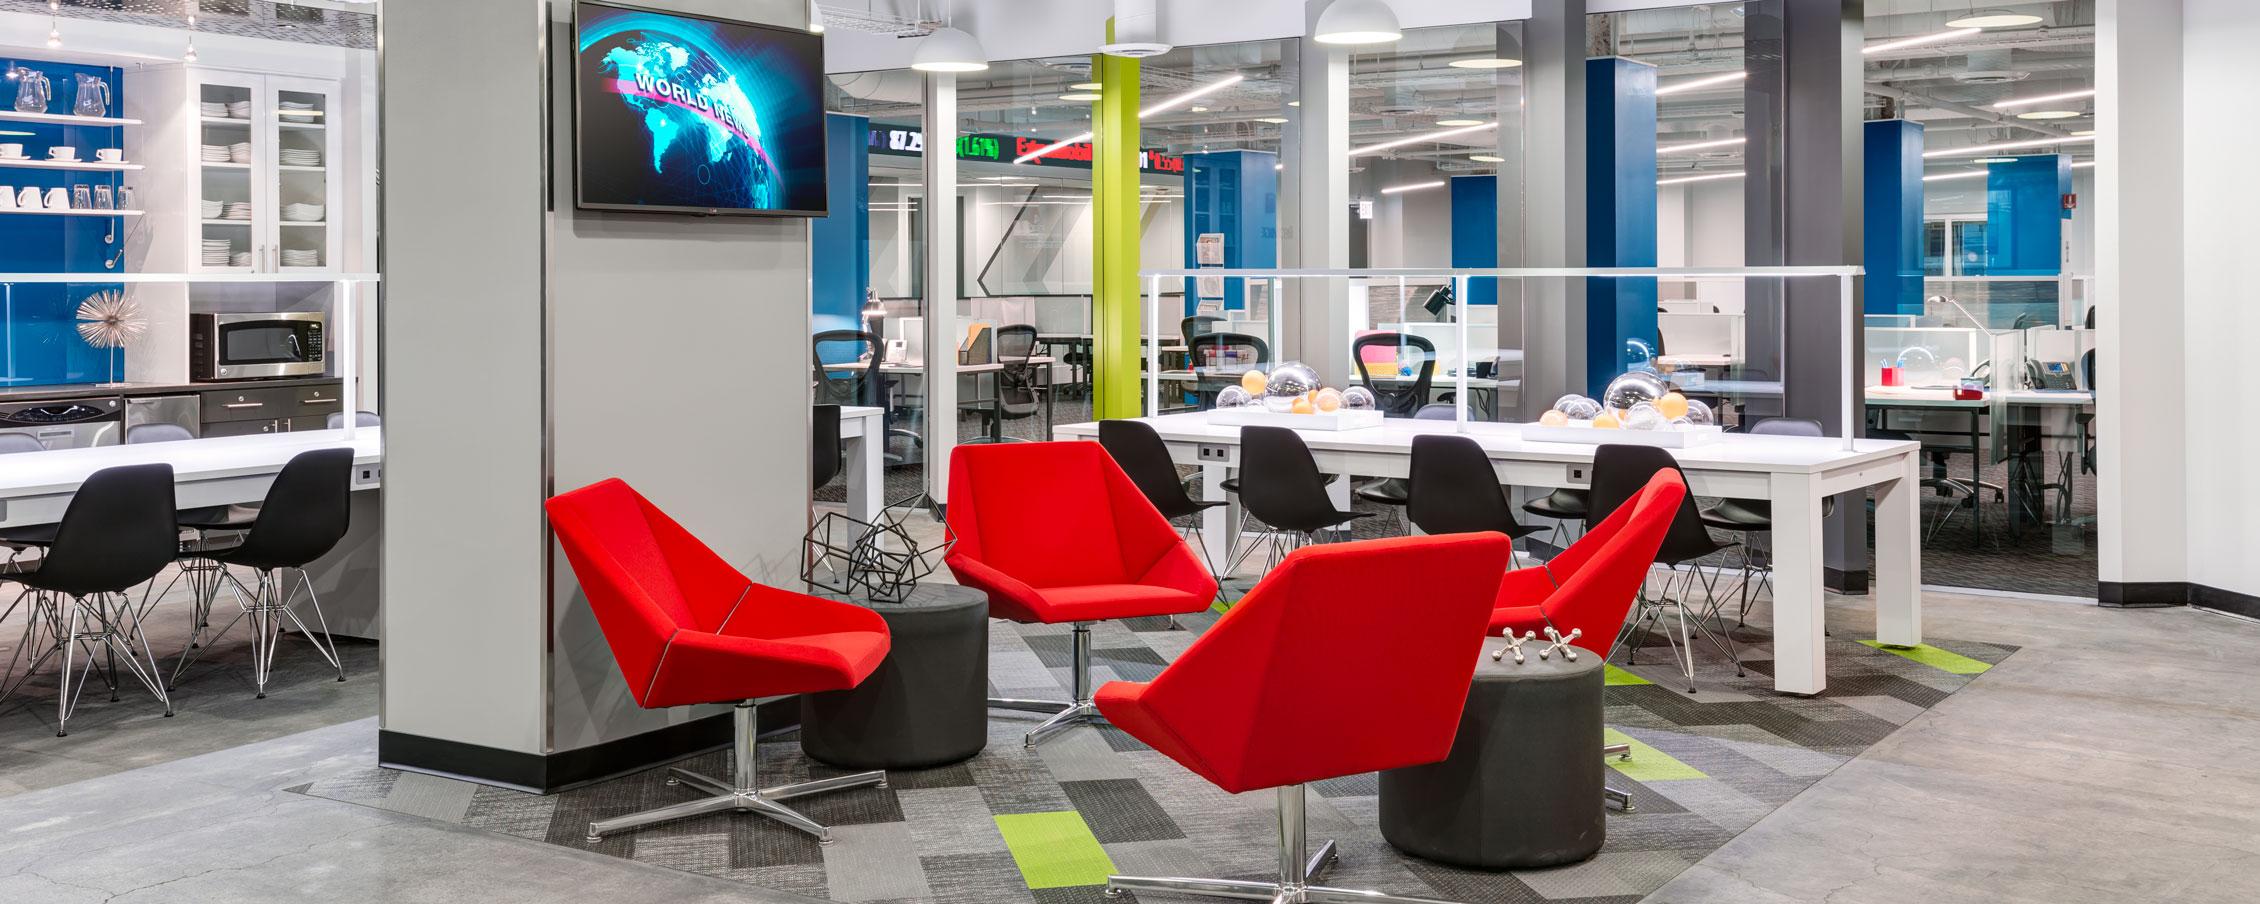 Regus Creates Workspaces Of The Future American Builders Quarterly